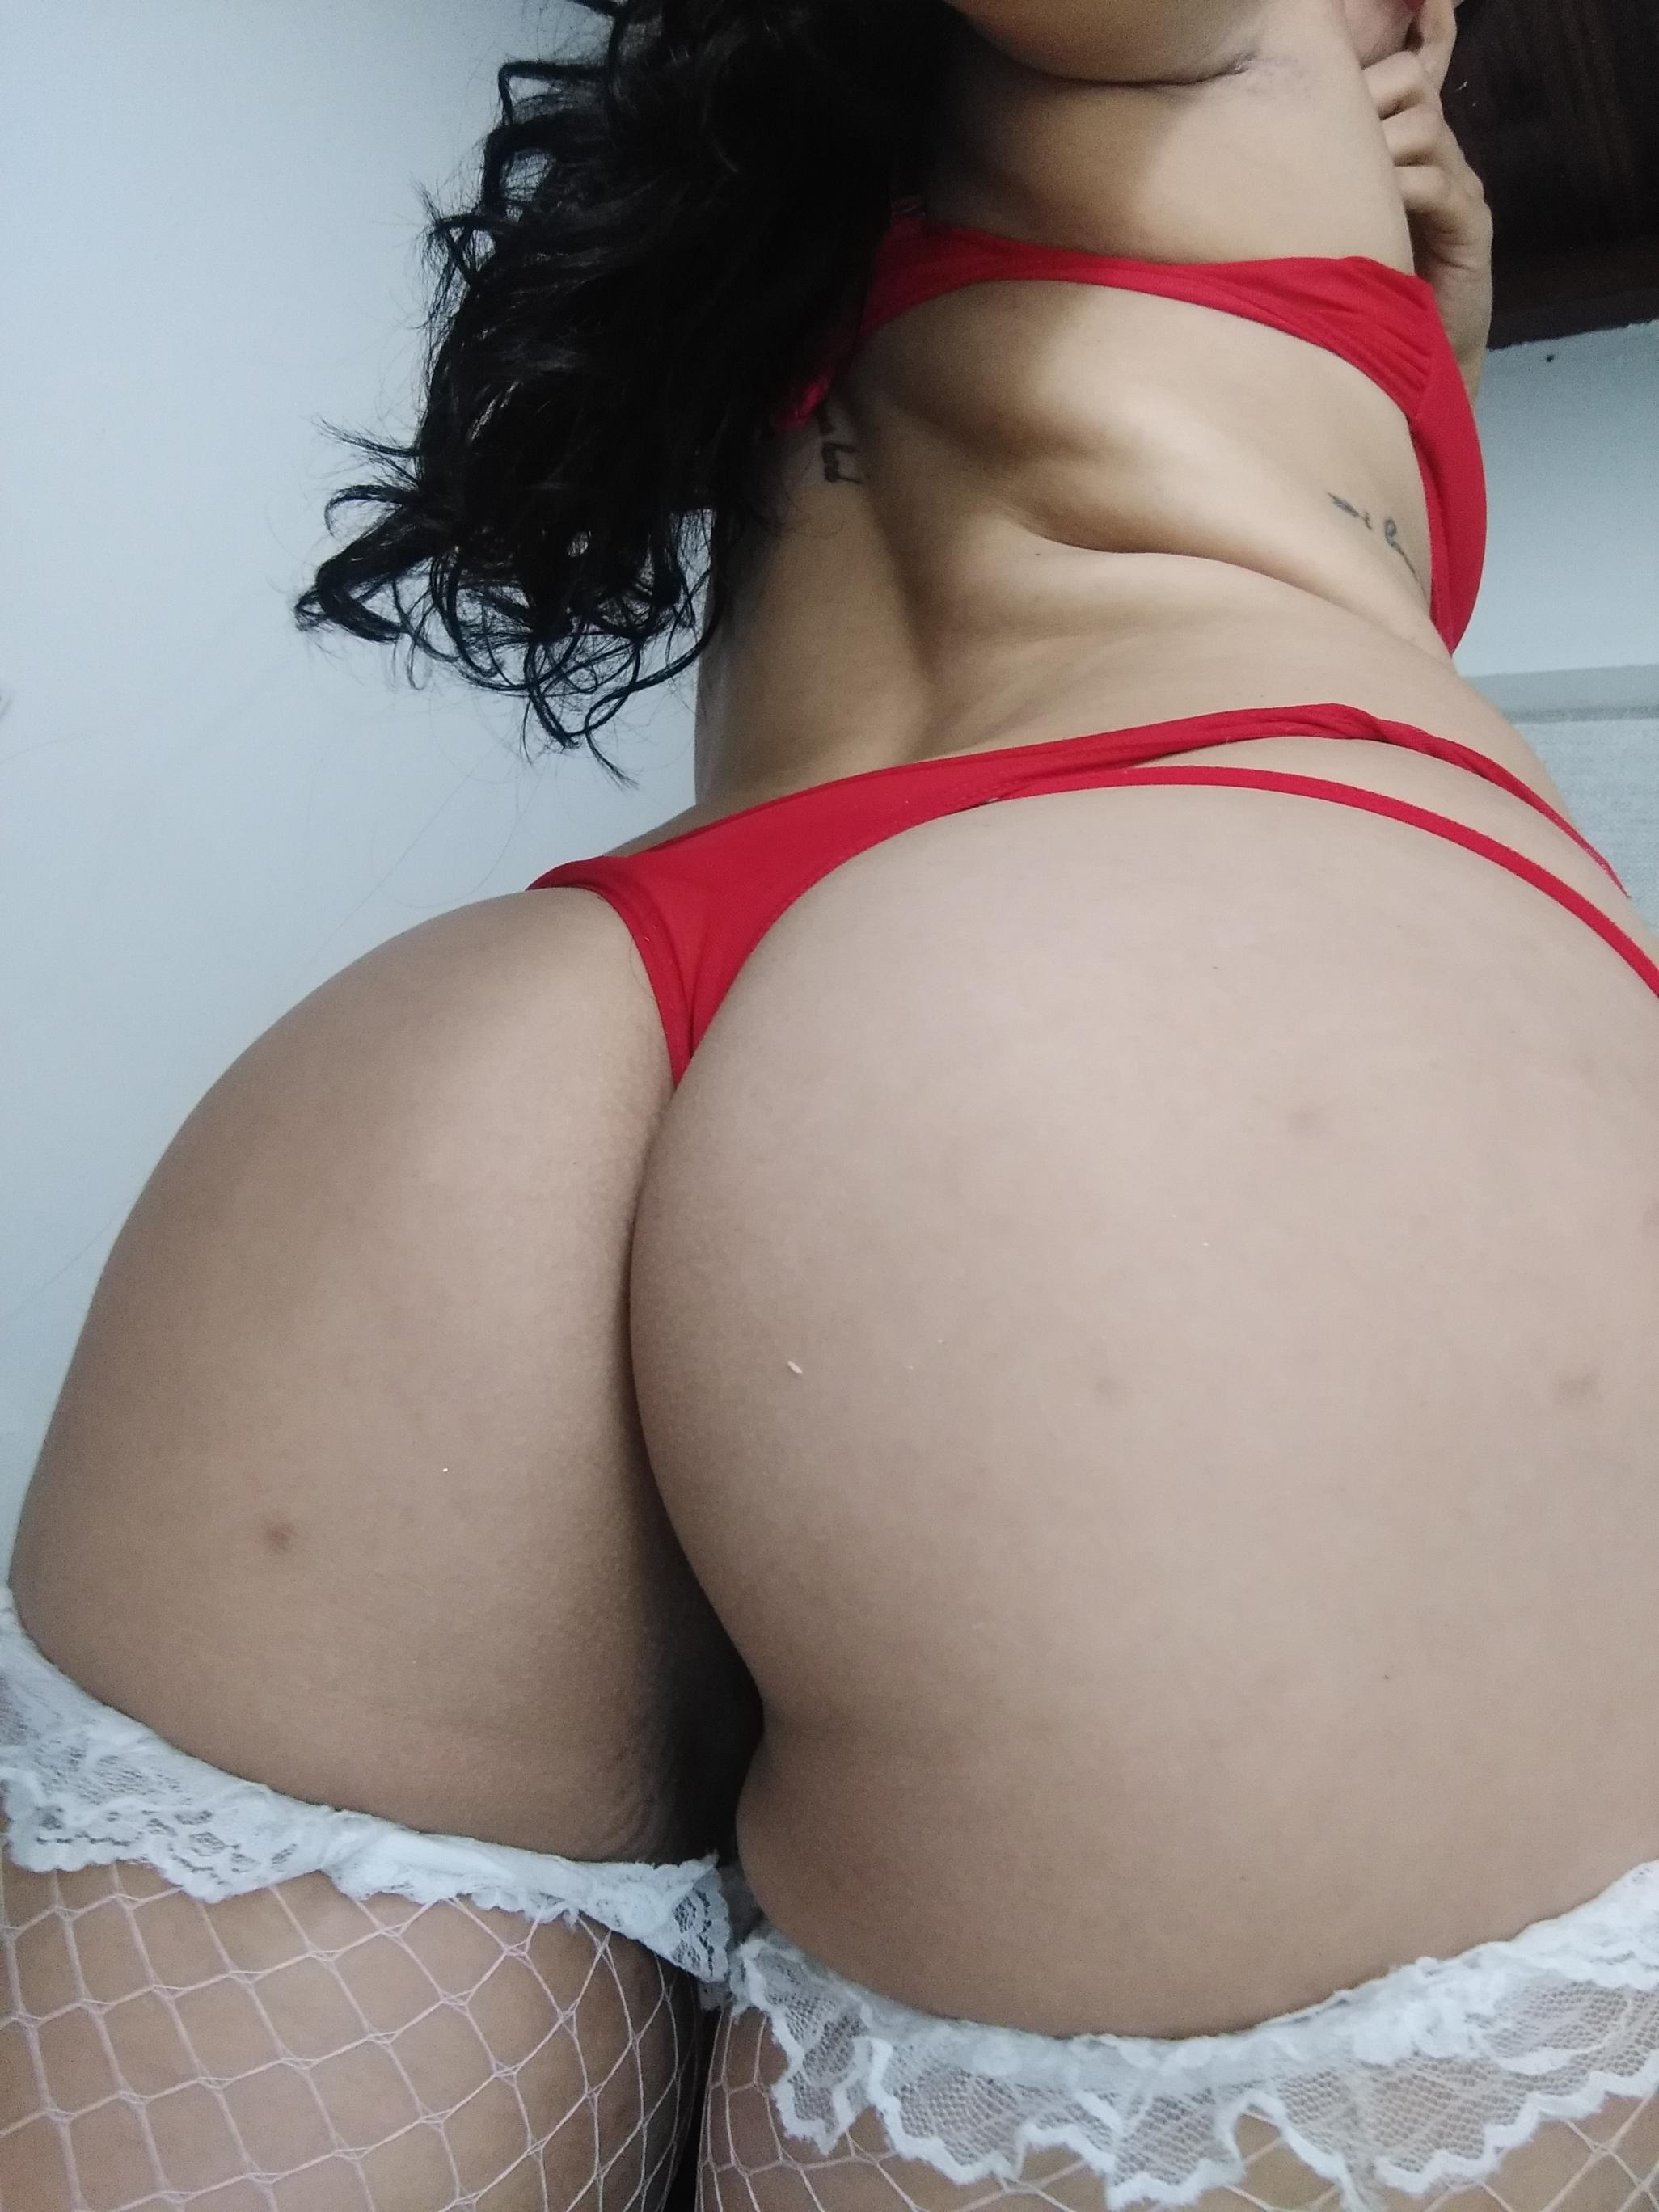 Samantha06S Homepage On Myfreecamscom-9735